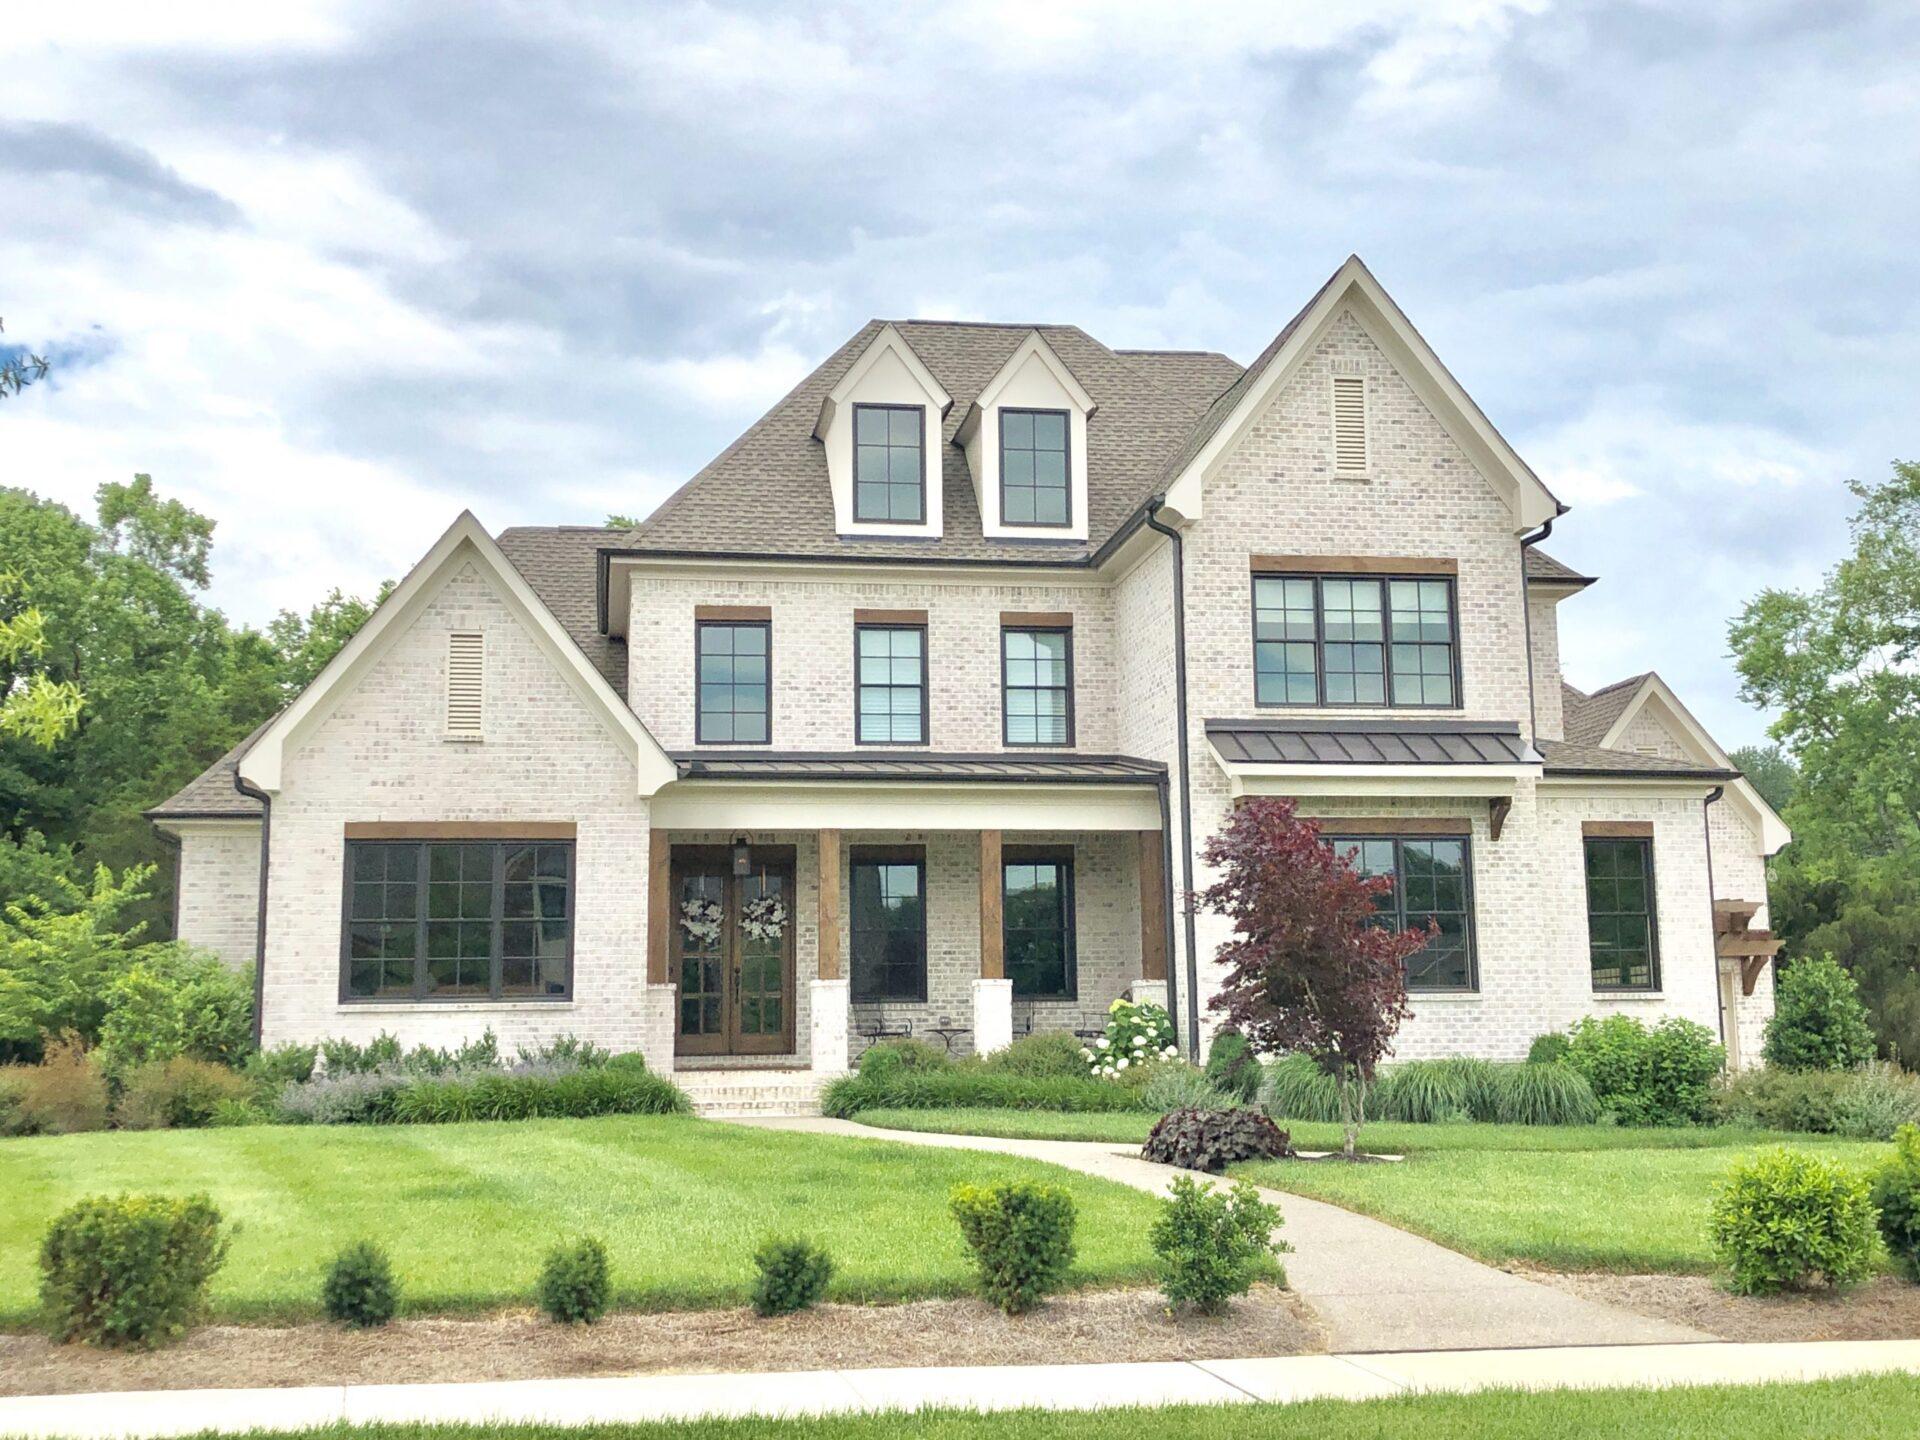 Nottingham III - High-end home builders for luxury homes - luxury home builder | Nashville, TN